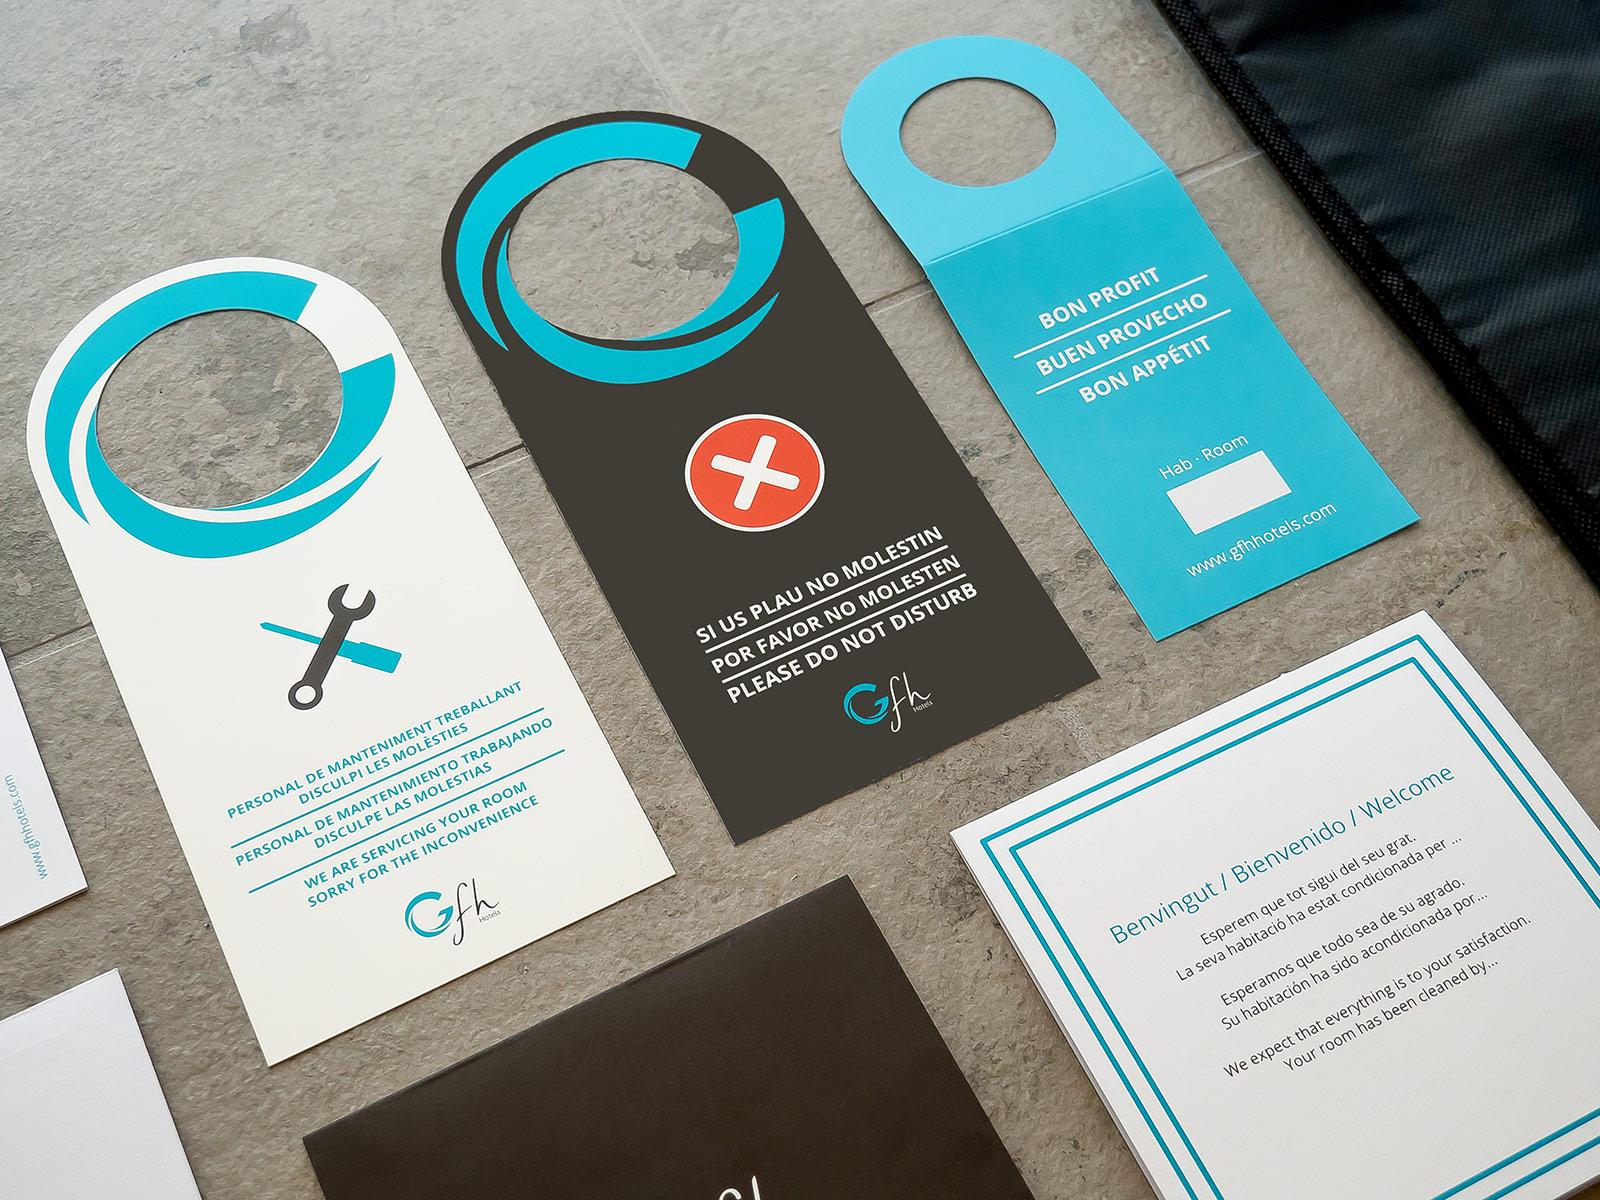 diseño grafico  Identidad corporativa     6